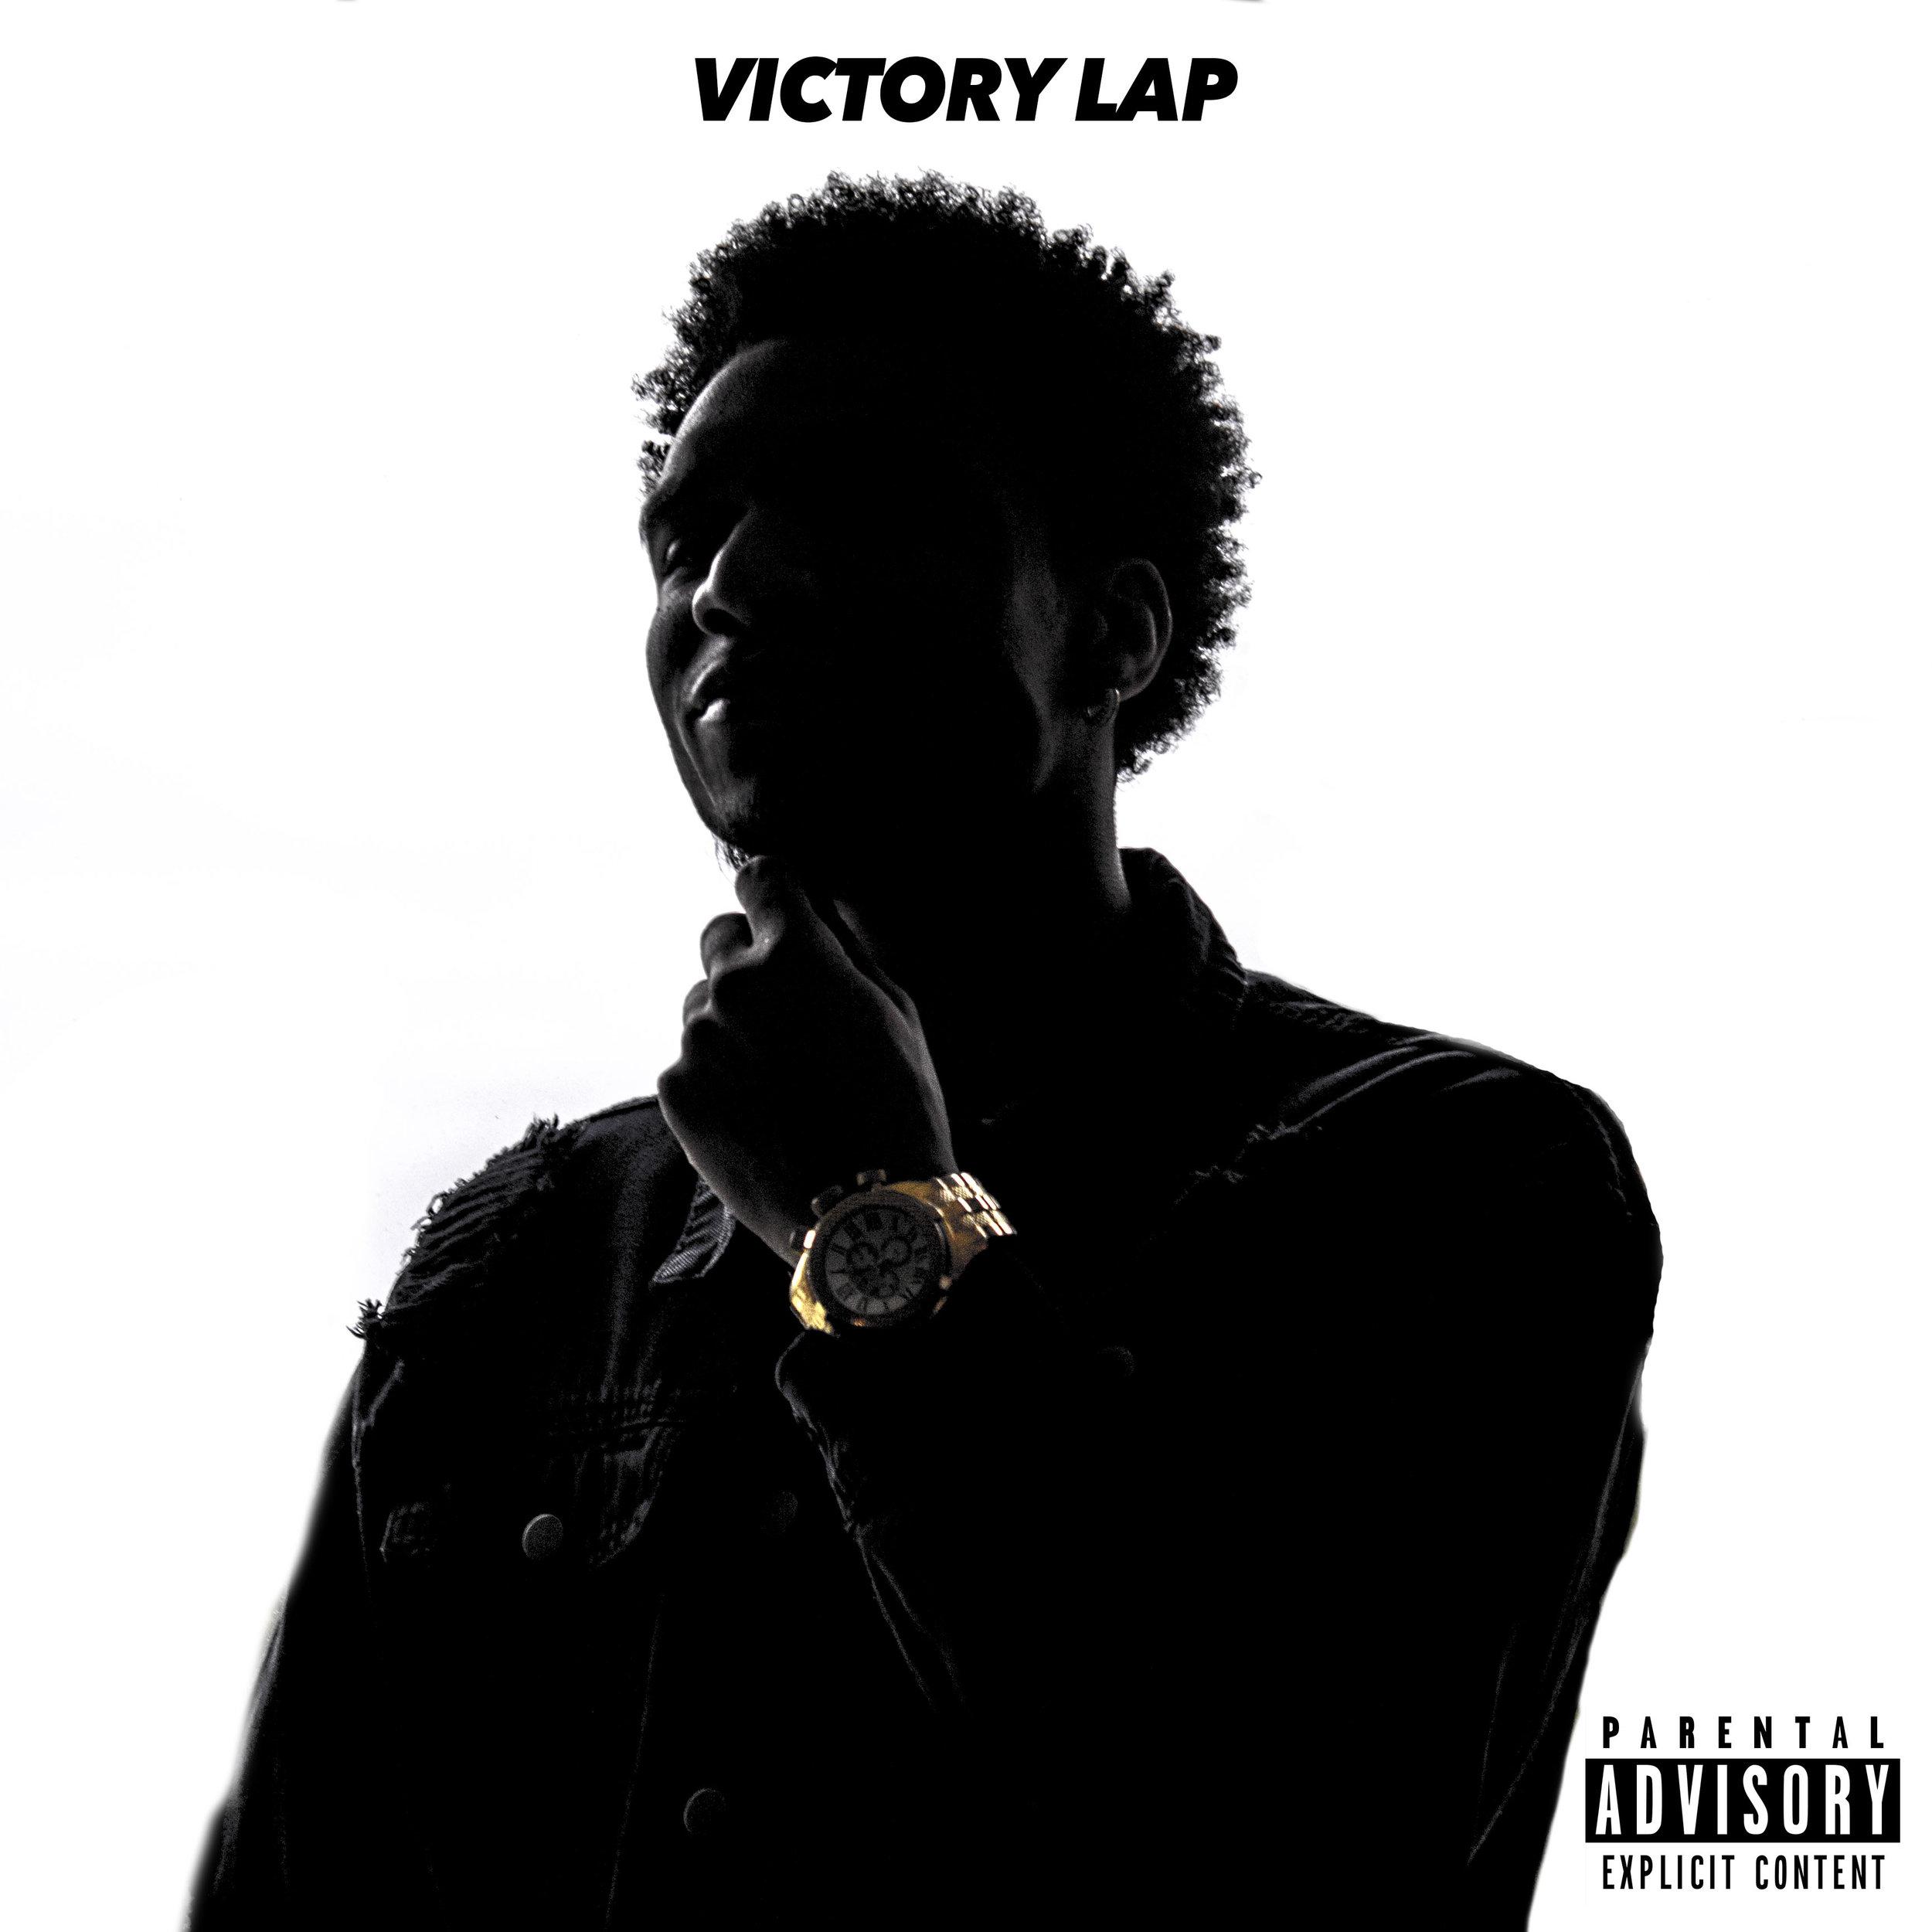 Smoove - Victory Lap